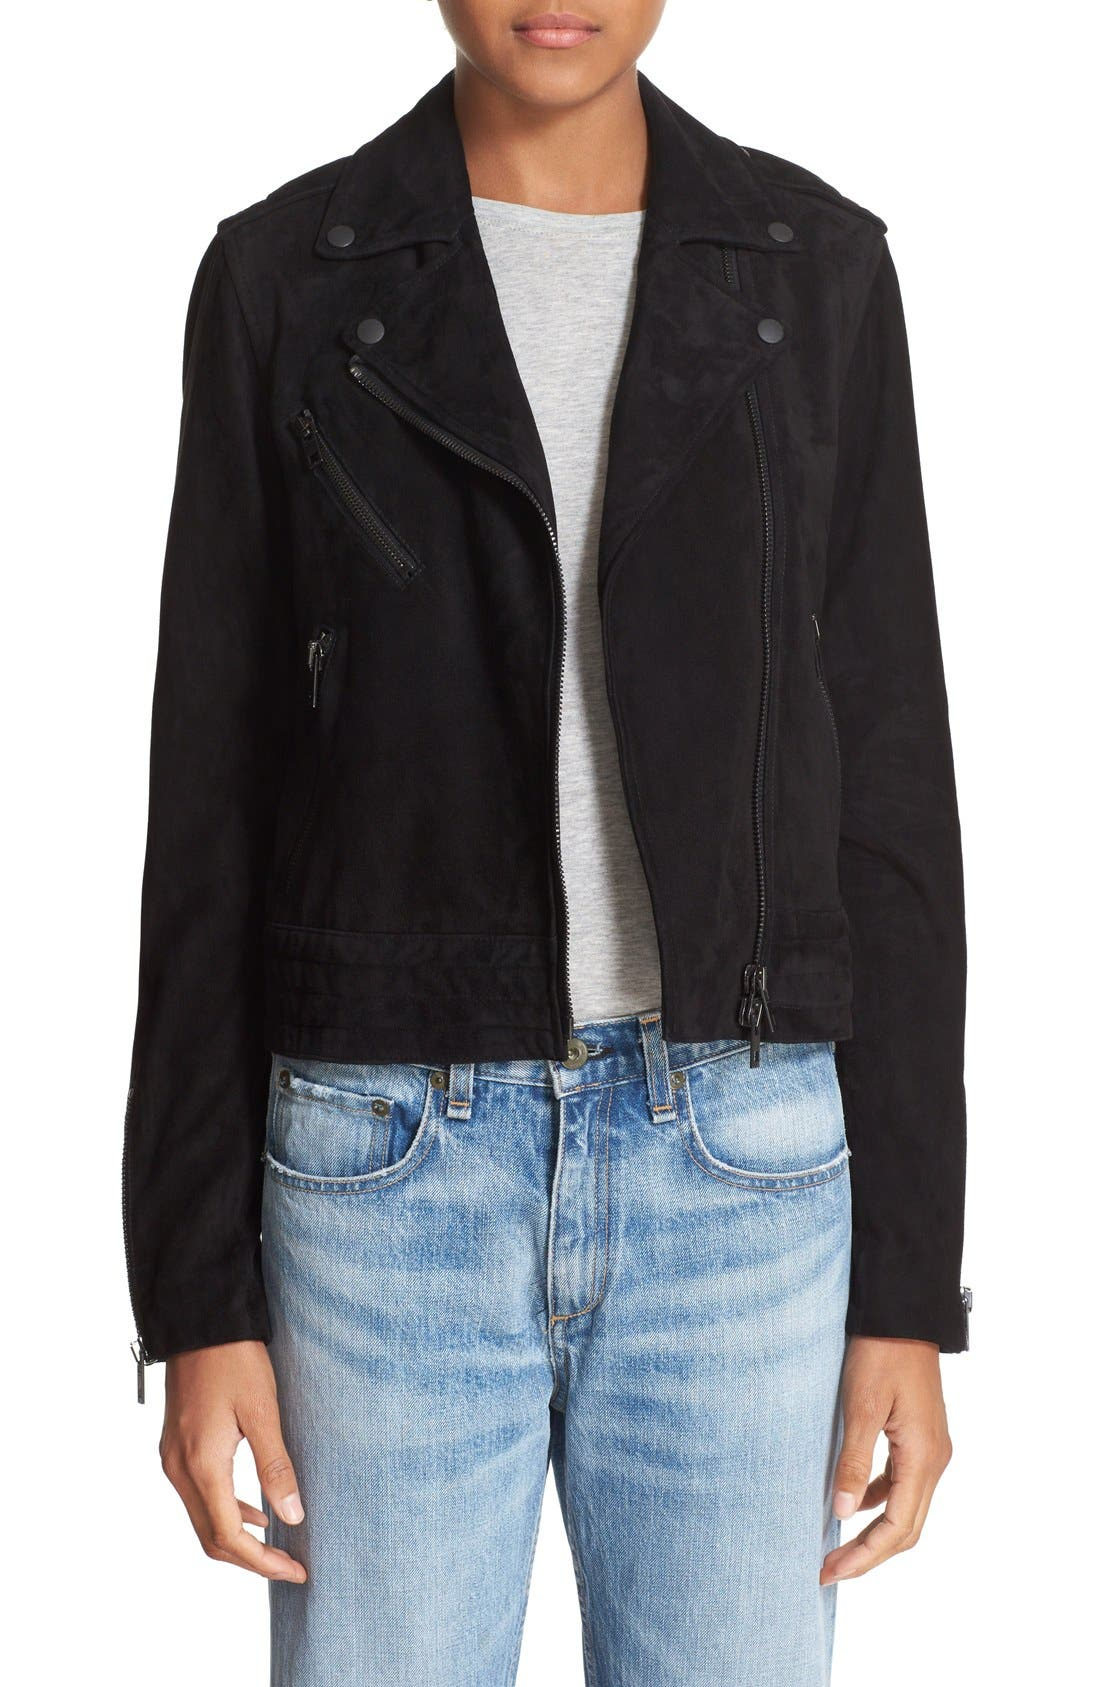 Main Image - rag & bone/JEAN 'Mercer' Suede Jacket